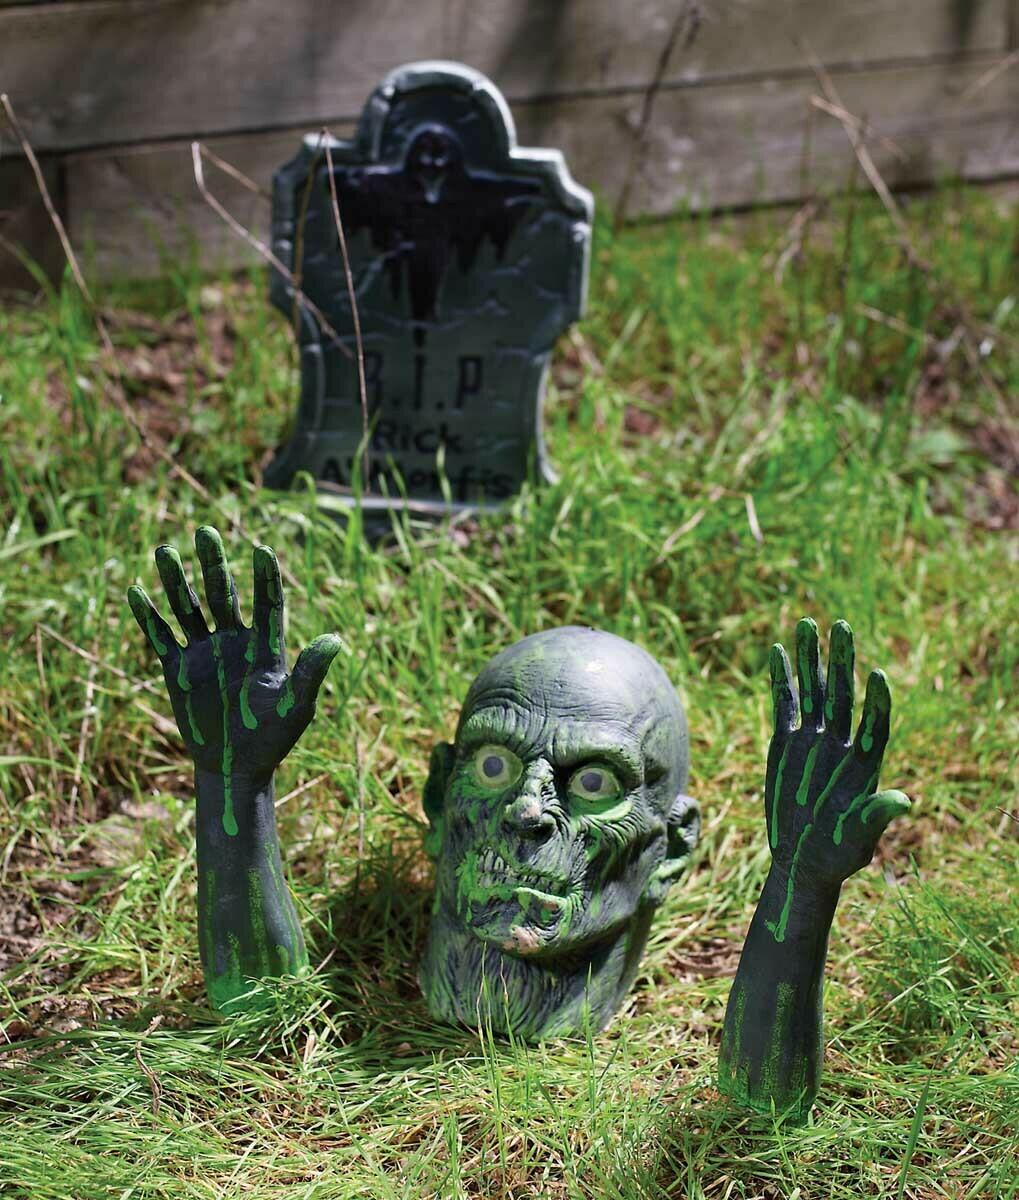 Zombie Ground Breaker Lawn Decor